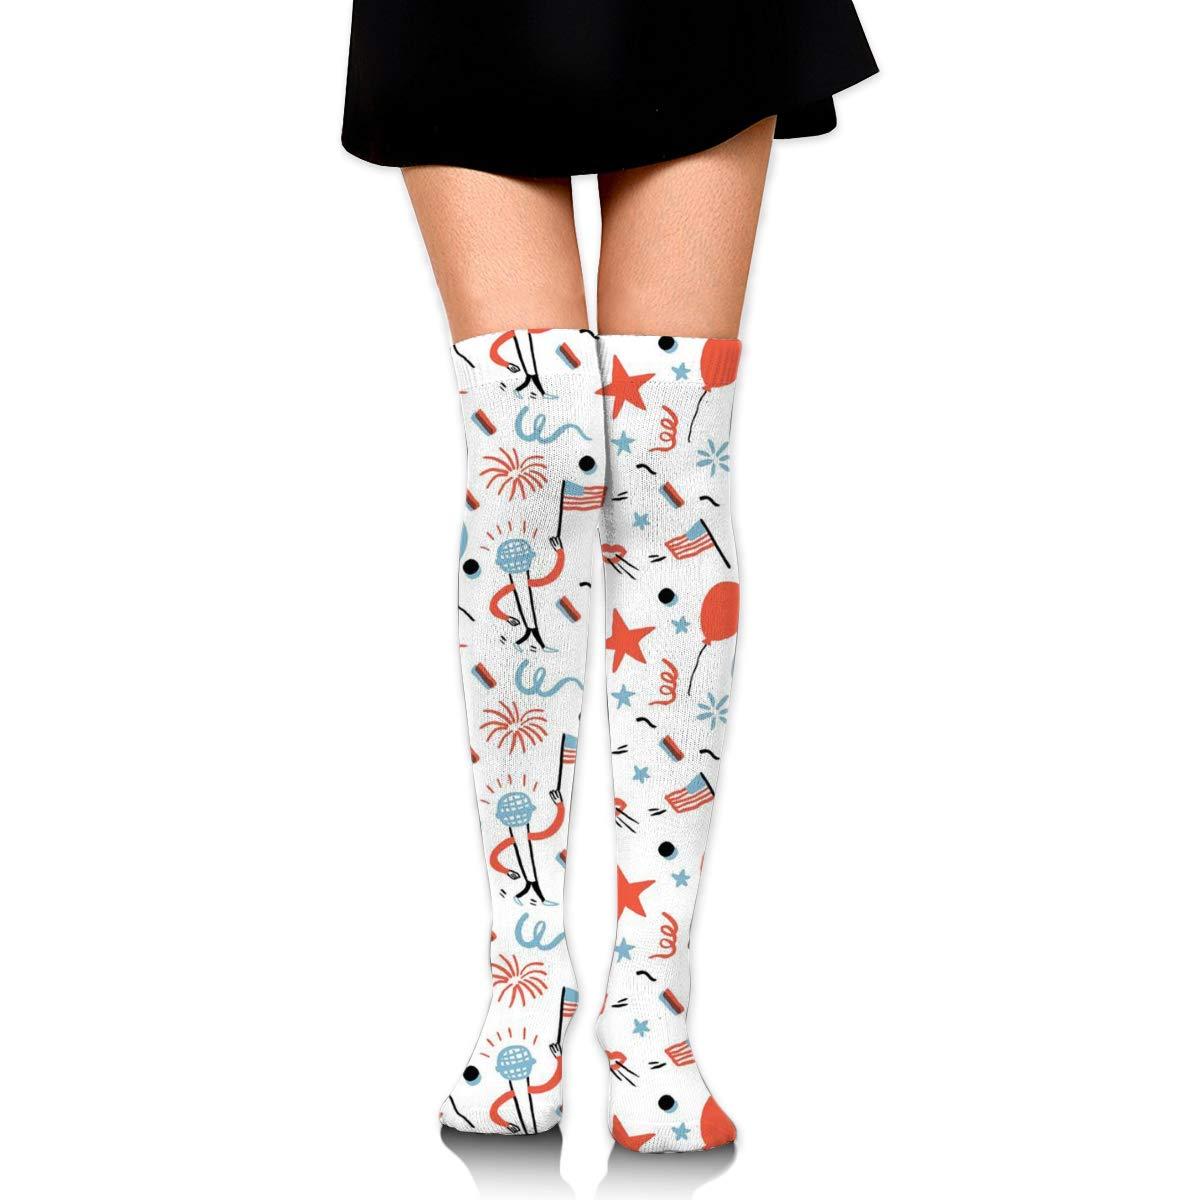 Women Crew Socks Thigh High Knee Star Hillary Pat Long Tube Dress Legging Soccer Compression Stocking